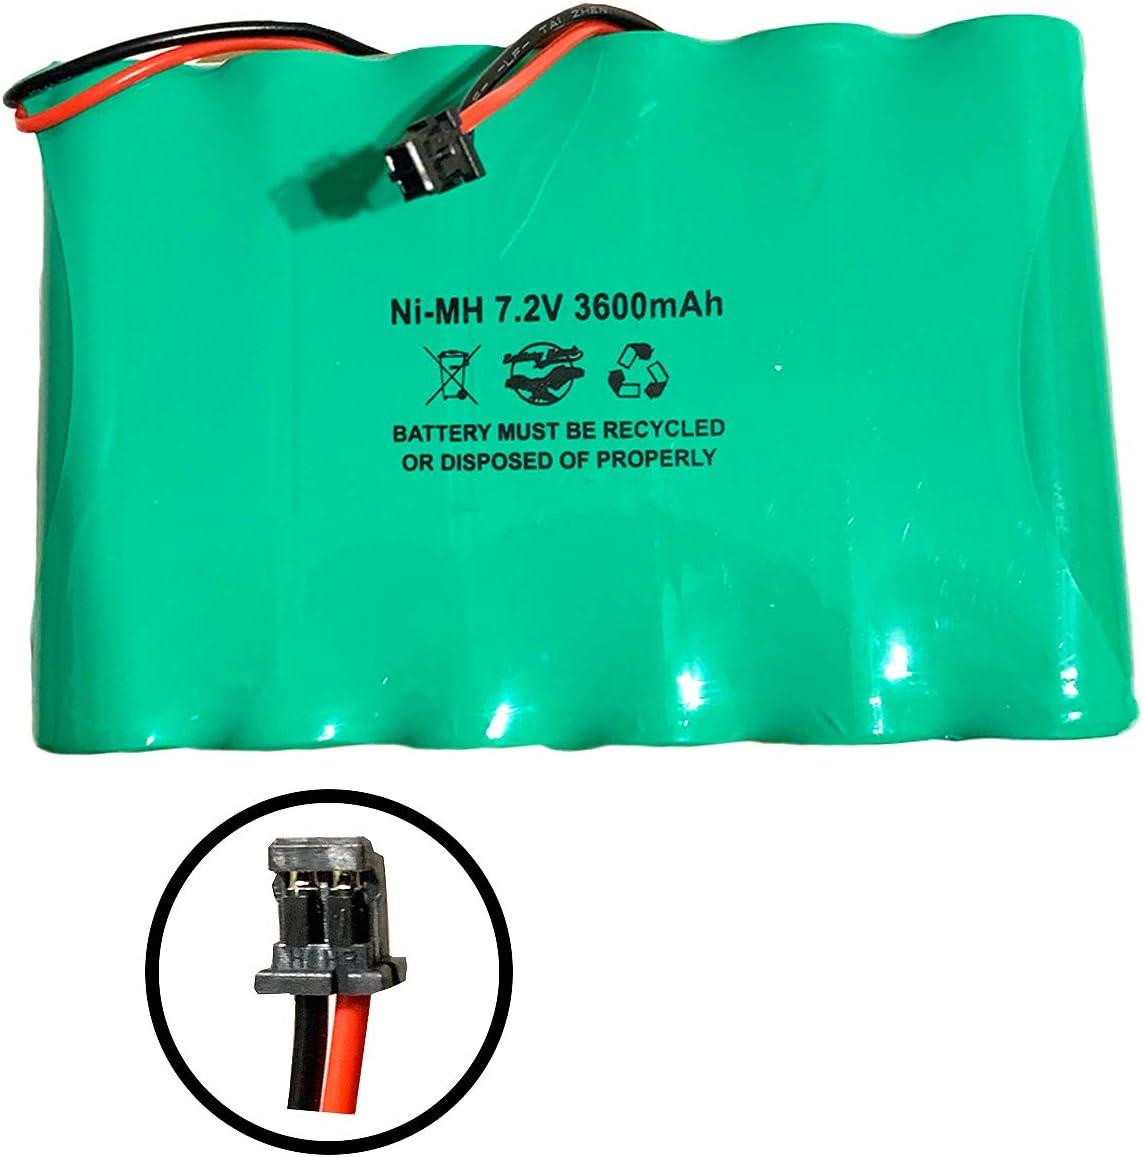 DSC IMPASSA 9057 Battery 6PH-H-4/3A3600-S-D22 7.2v 3600mAh Ni-MH Wireless Security System ADT SCW9057G-433